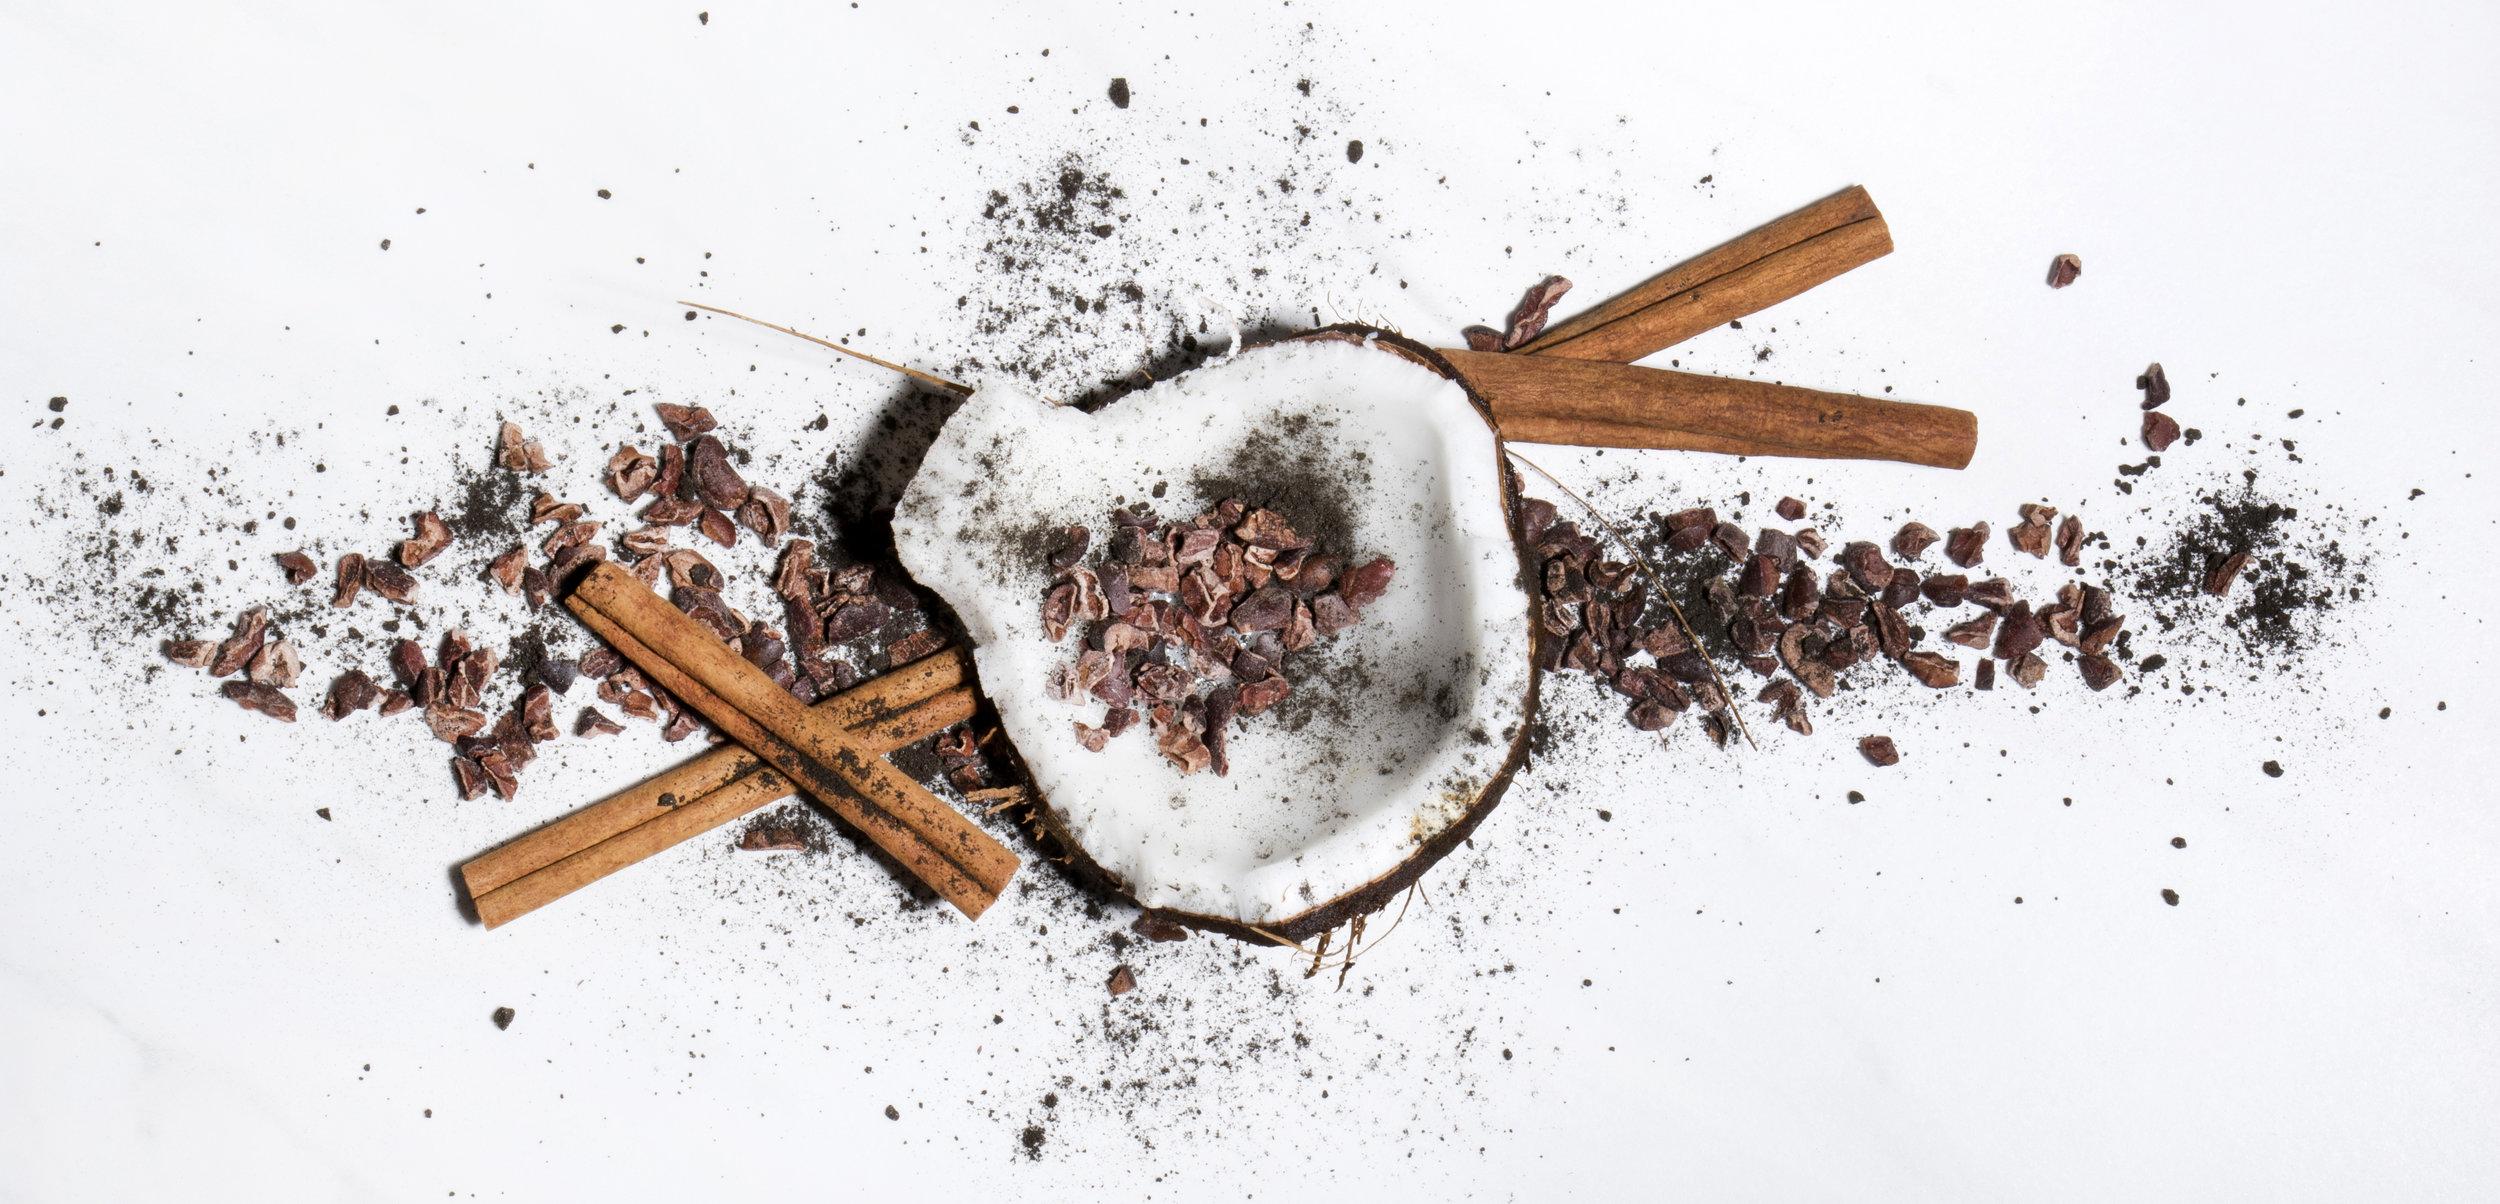 Cincinnati Food Photographer   Ingredient Photography   Coconut   Chocolate   Allison McAdams.jpg